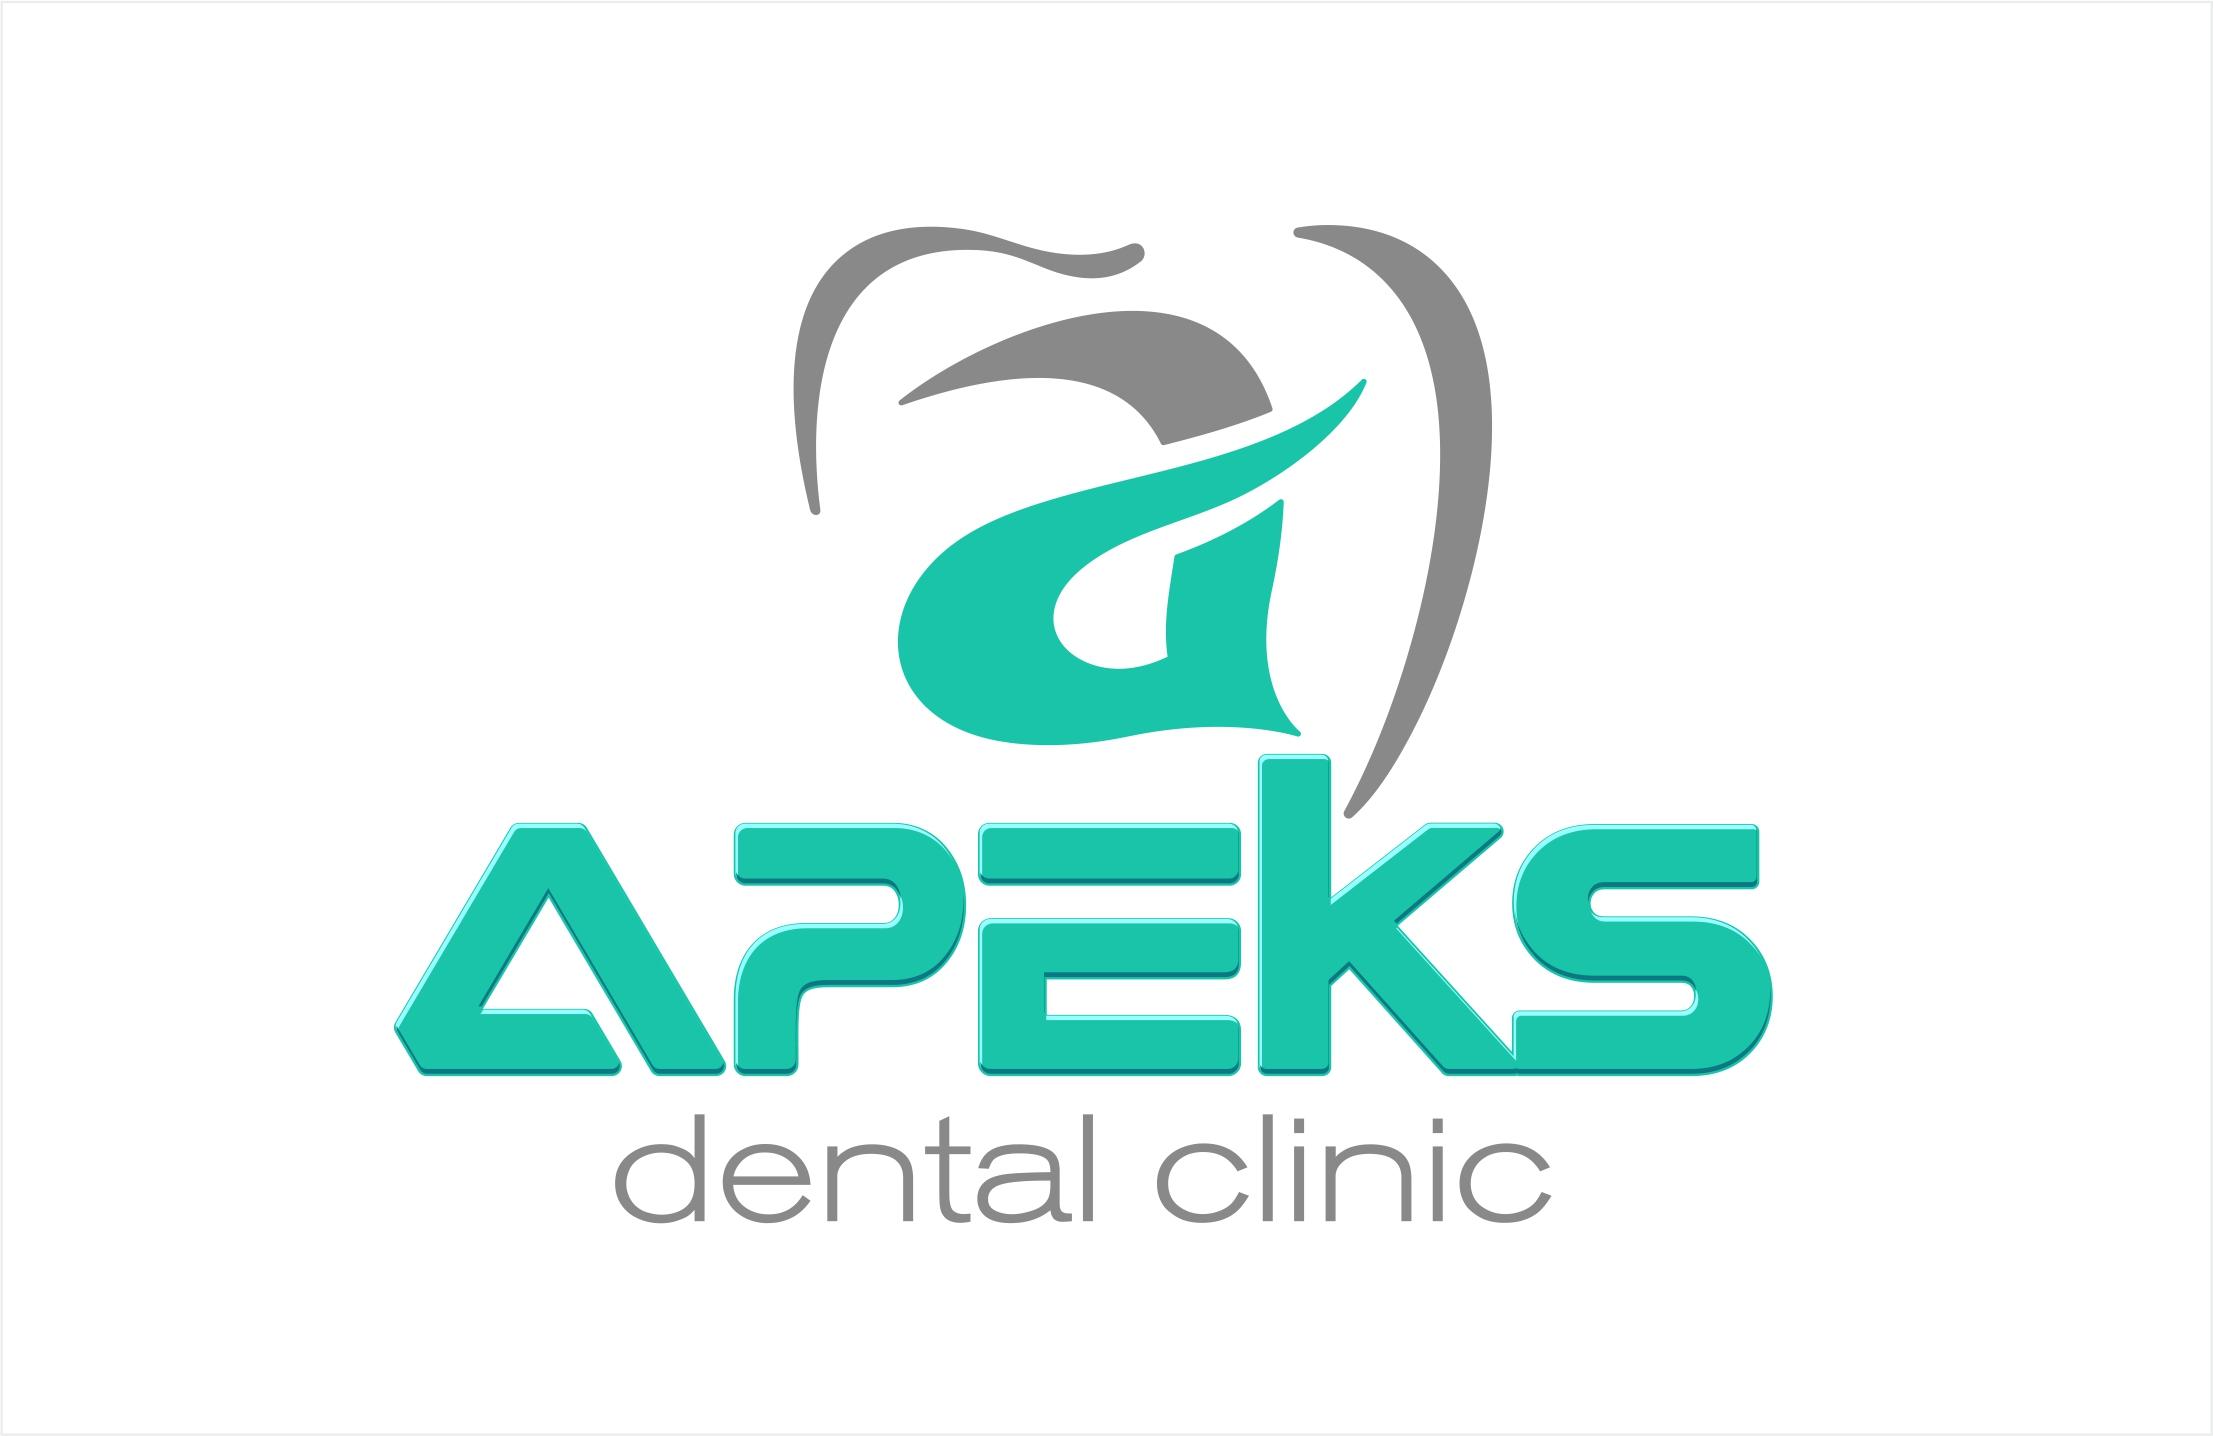 Логотип для стоматологии фото f_7355c8805df64214.jpg